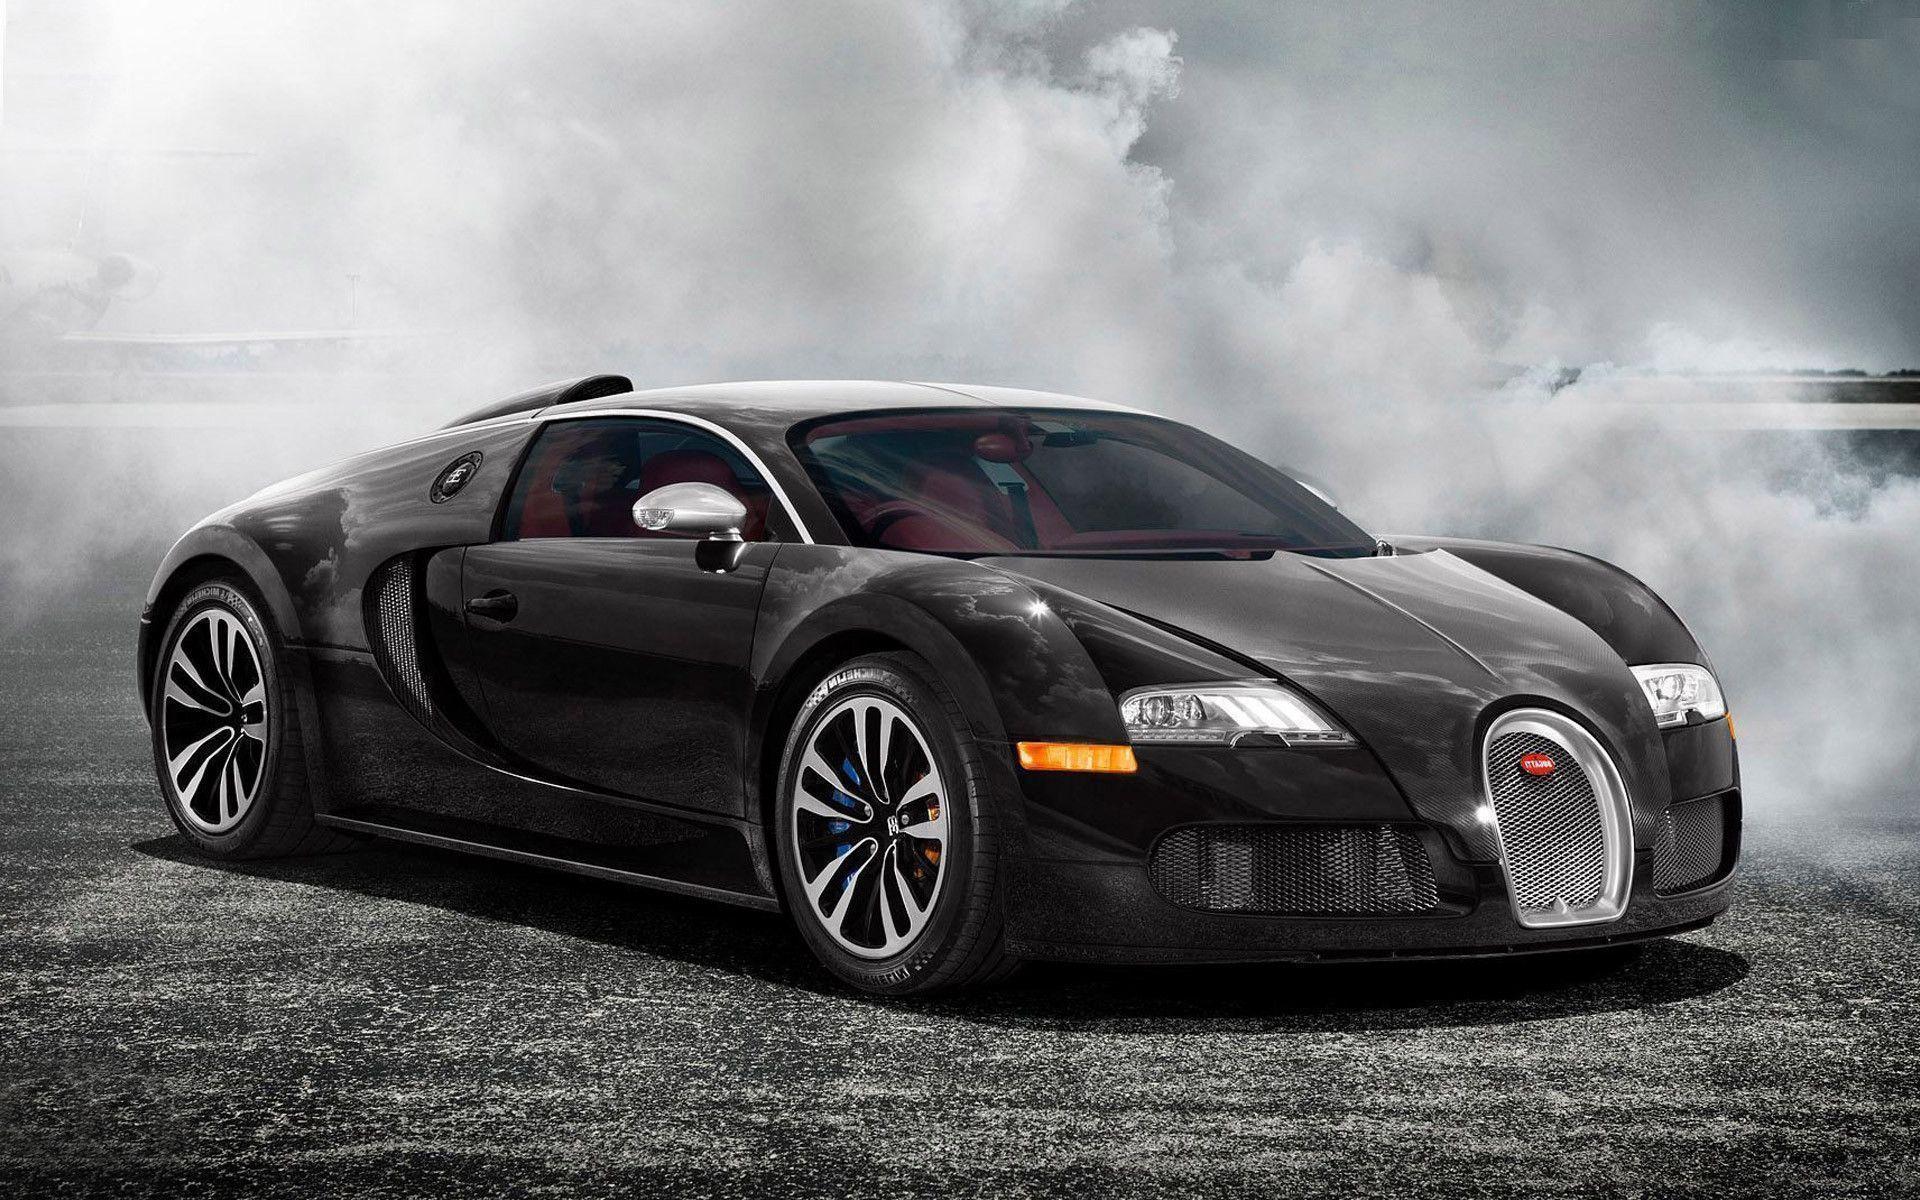 Nothing Found For Black Bugatti Veyron Hd